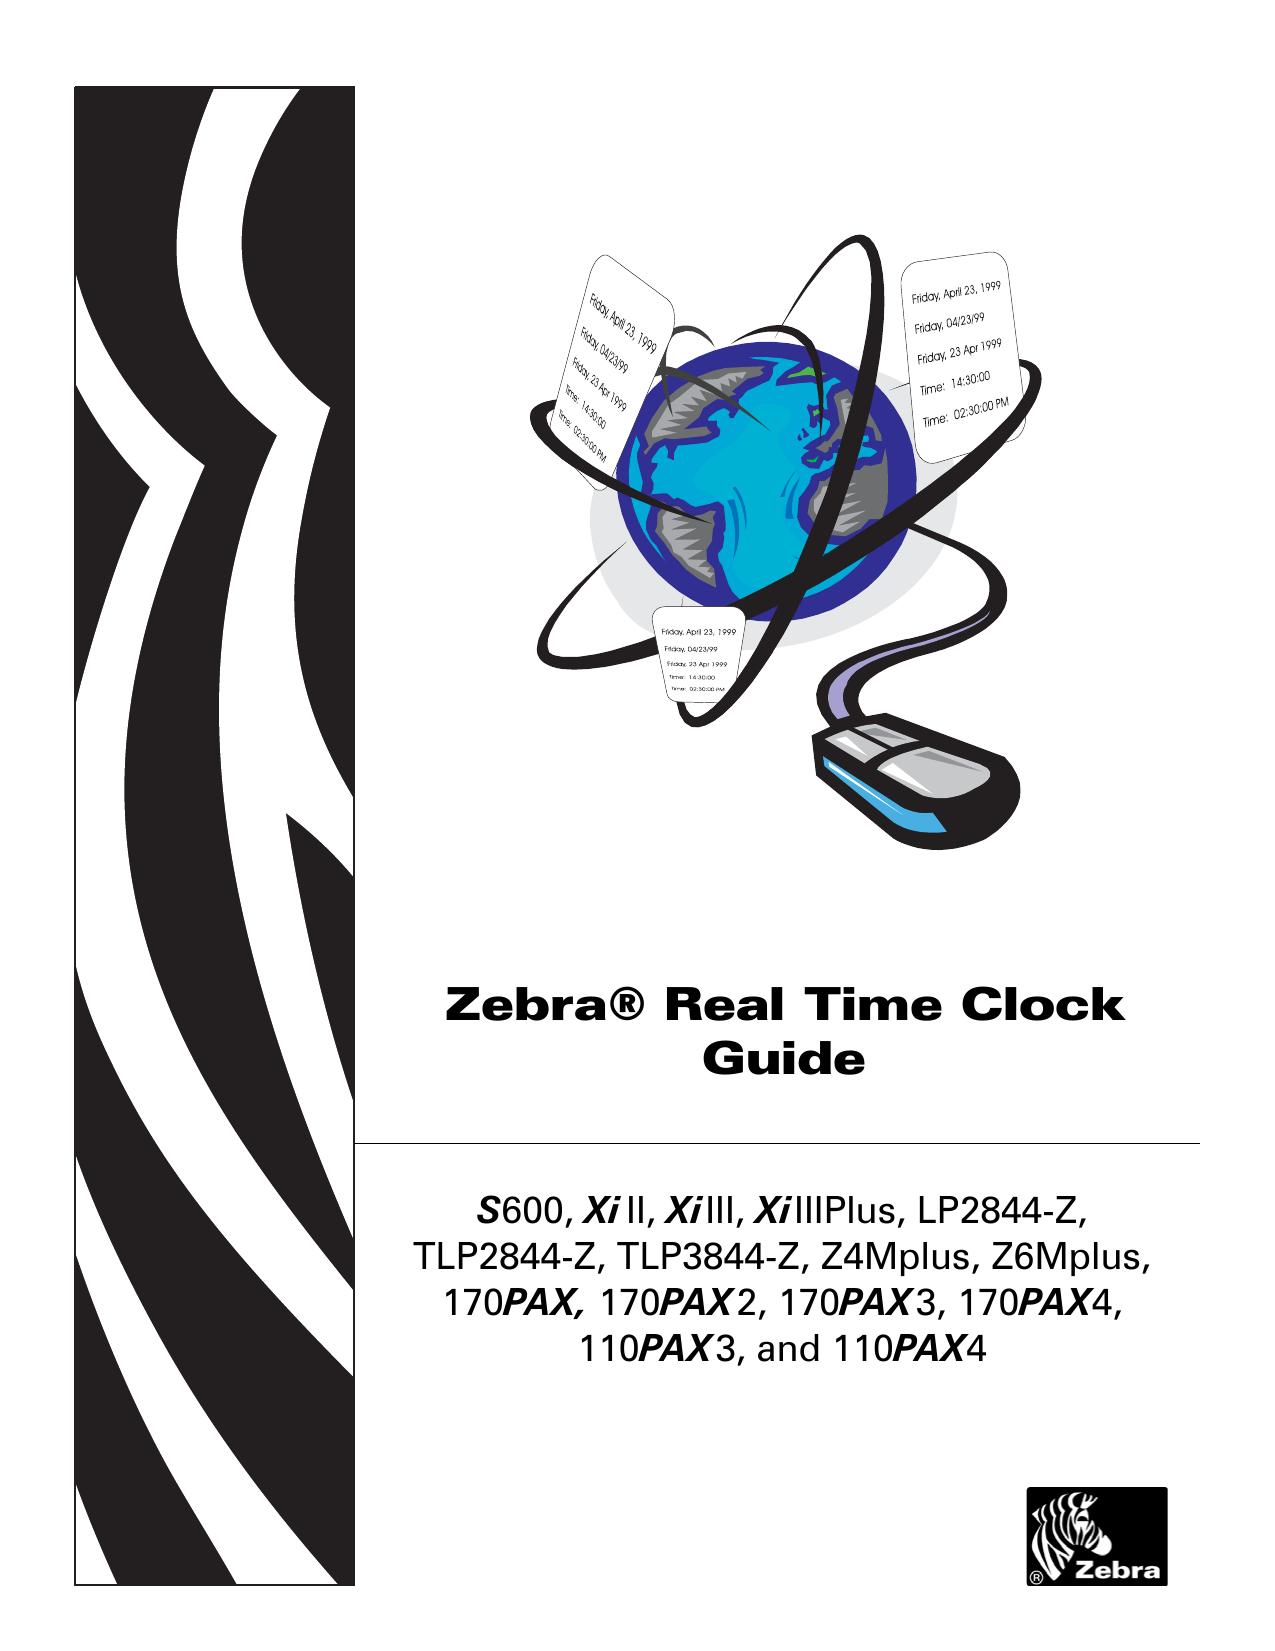 47867L-001-RA Real Time Clock Guide | manualzz com